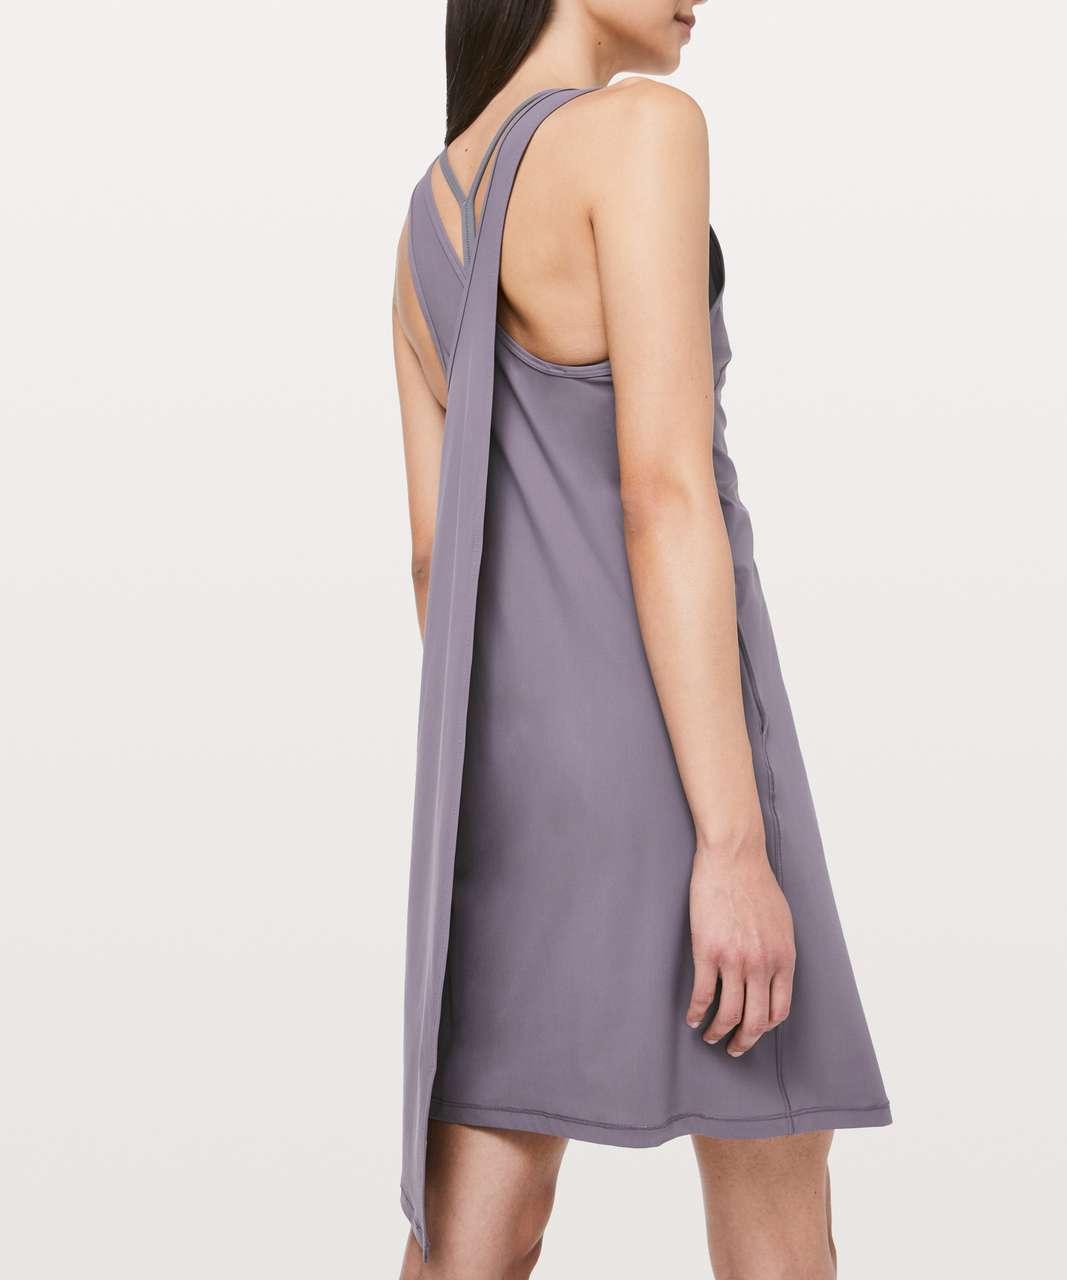 Lululemon Early Morning Dress - Graphite Purple